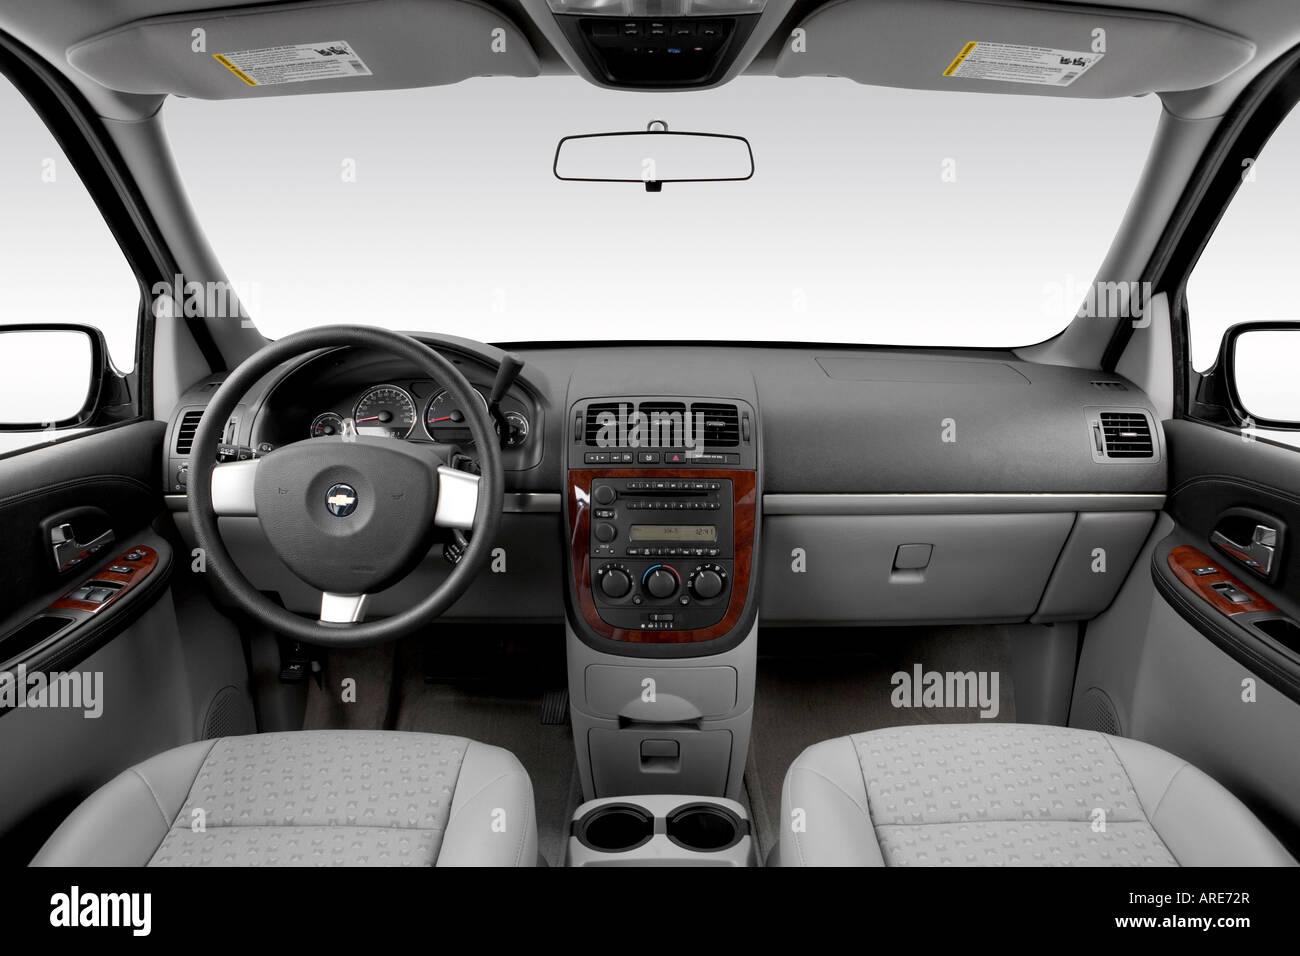 2006 chevrolet uplander lt in blue dashboard center console gear shifter view